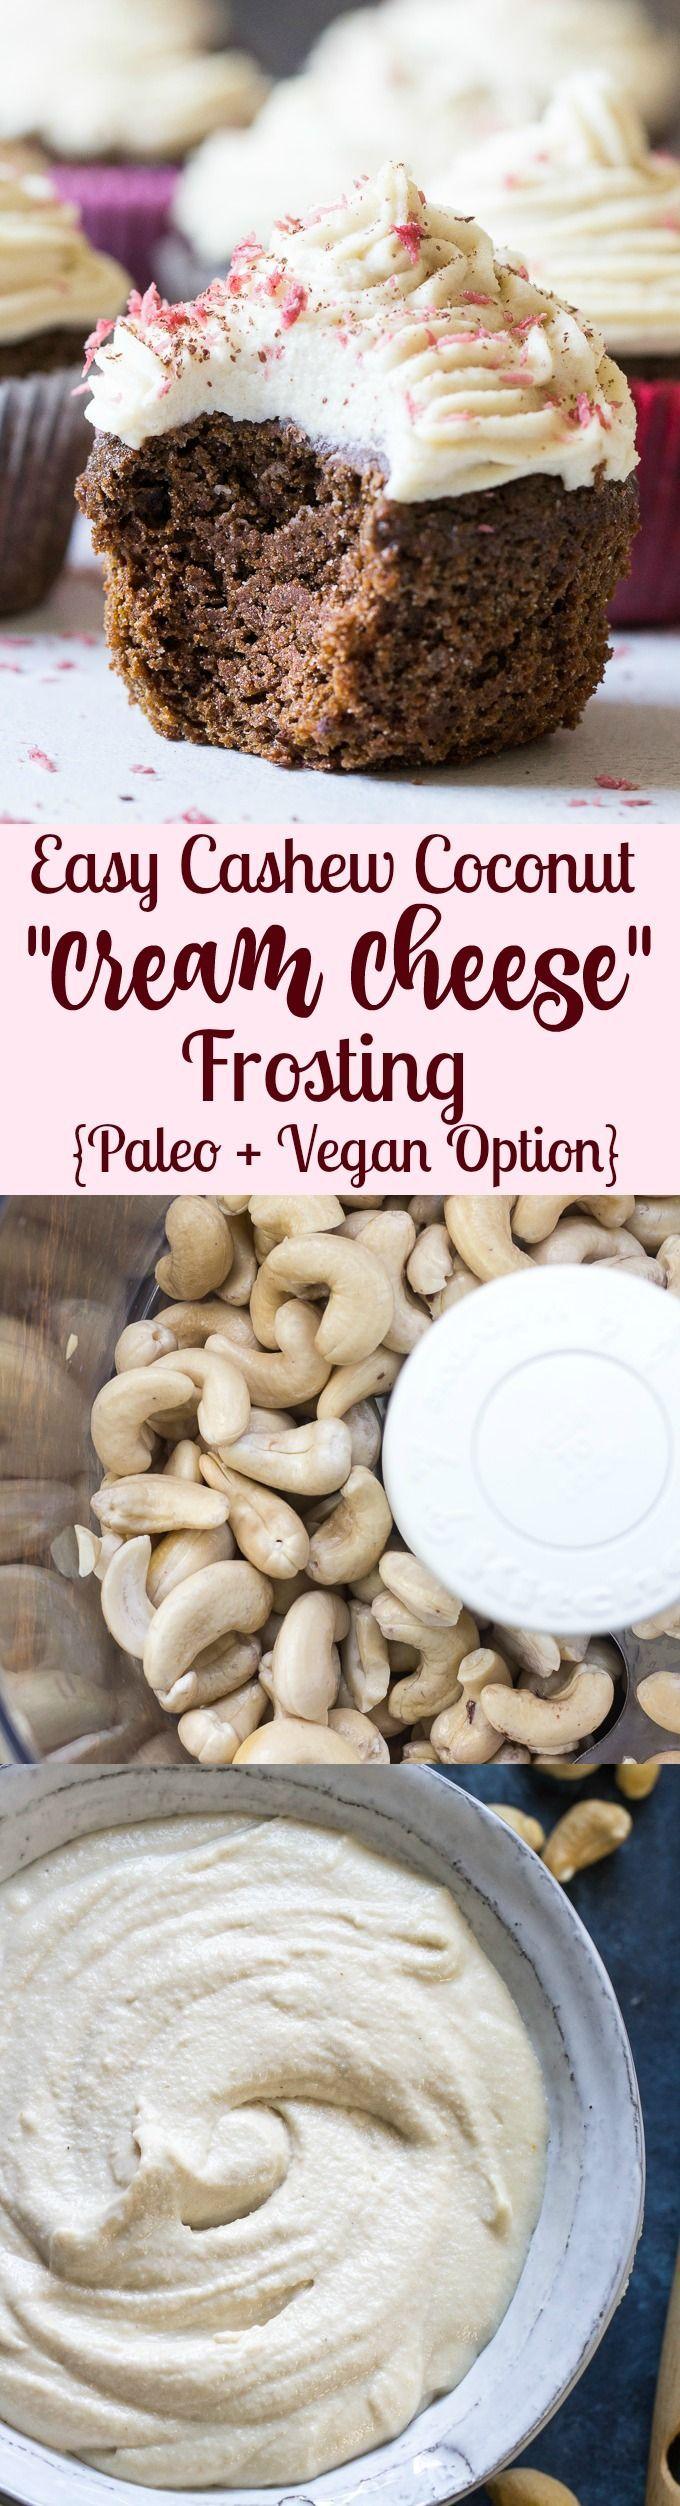 Coconut Cashew Cream Cheese Frosting (Paleo w/Vegan Option)